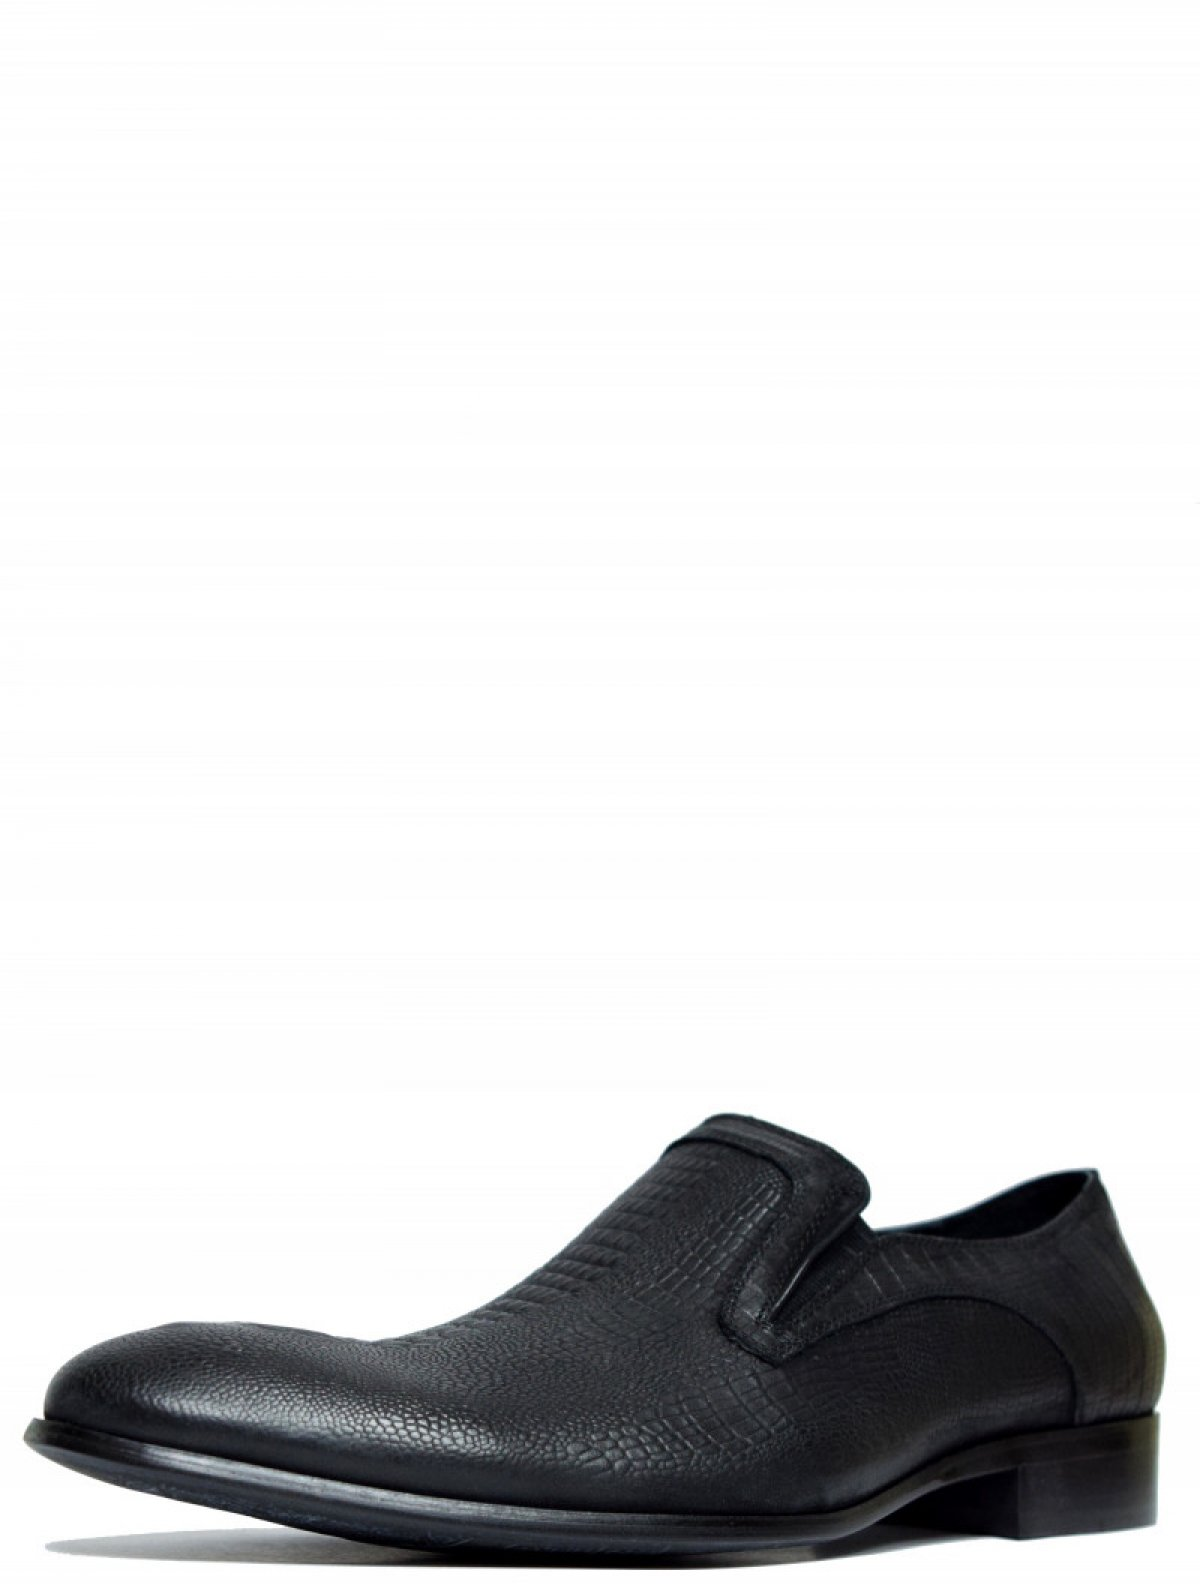 TerraiMpossa 114209/N мужские туфли